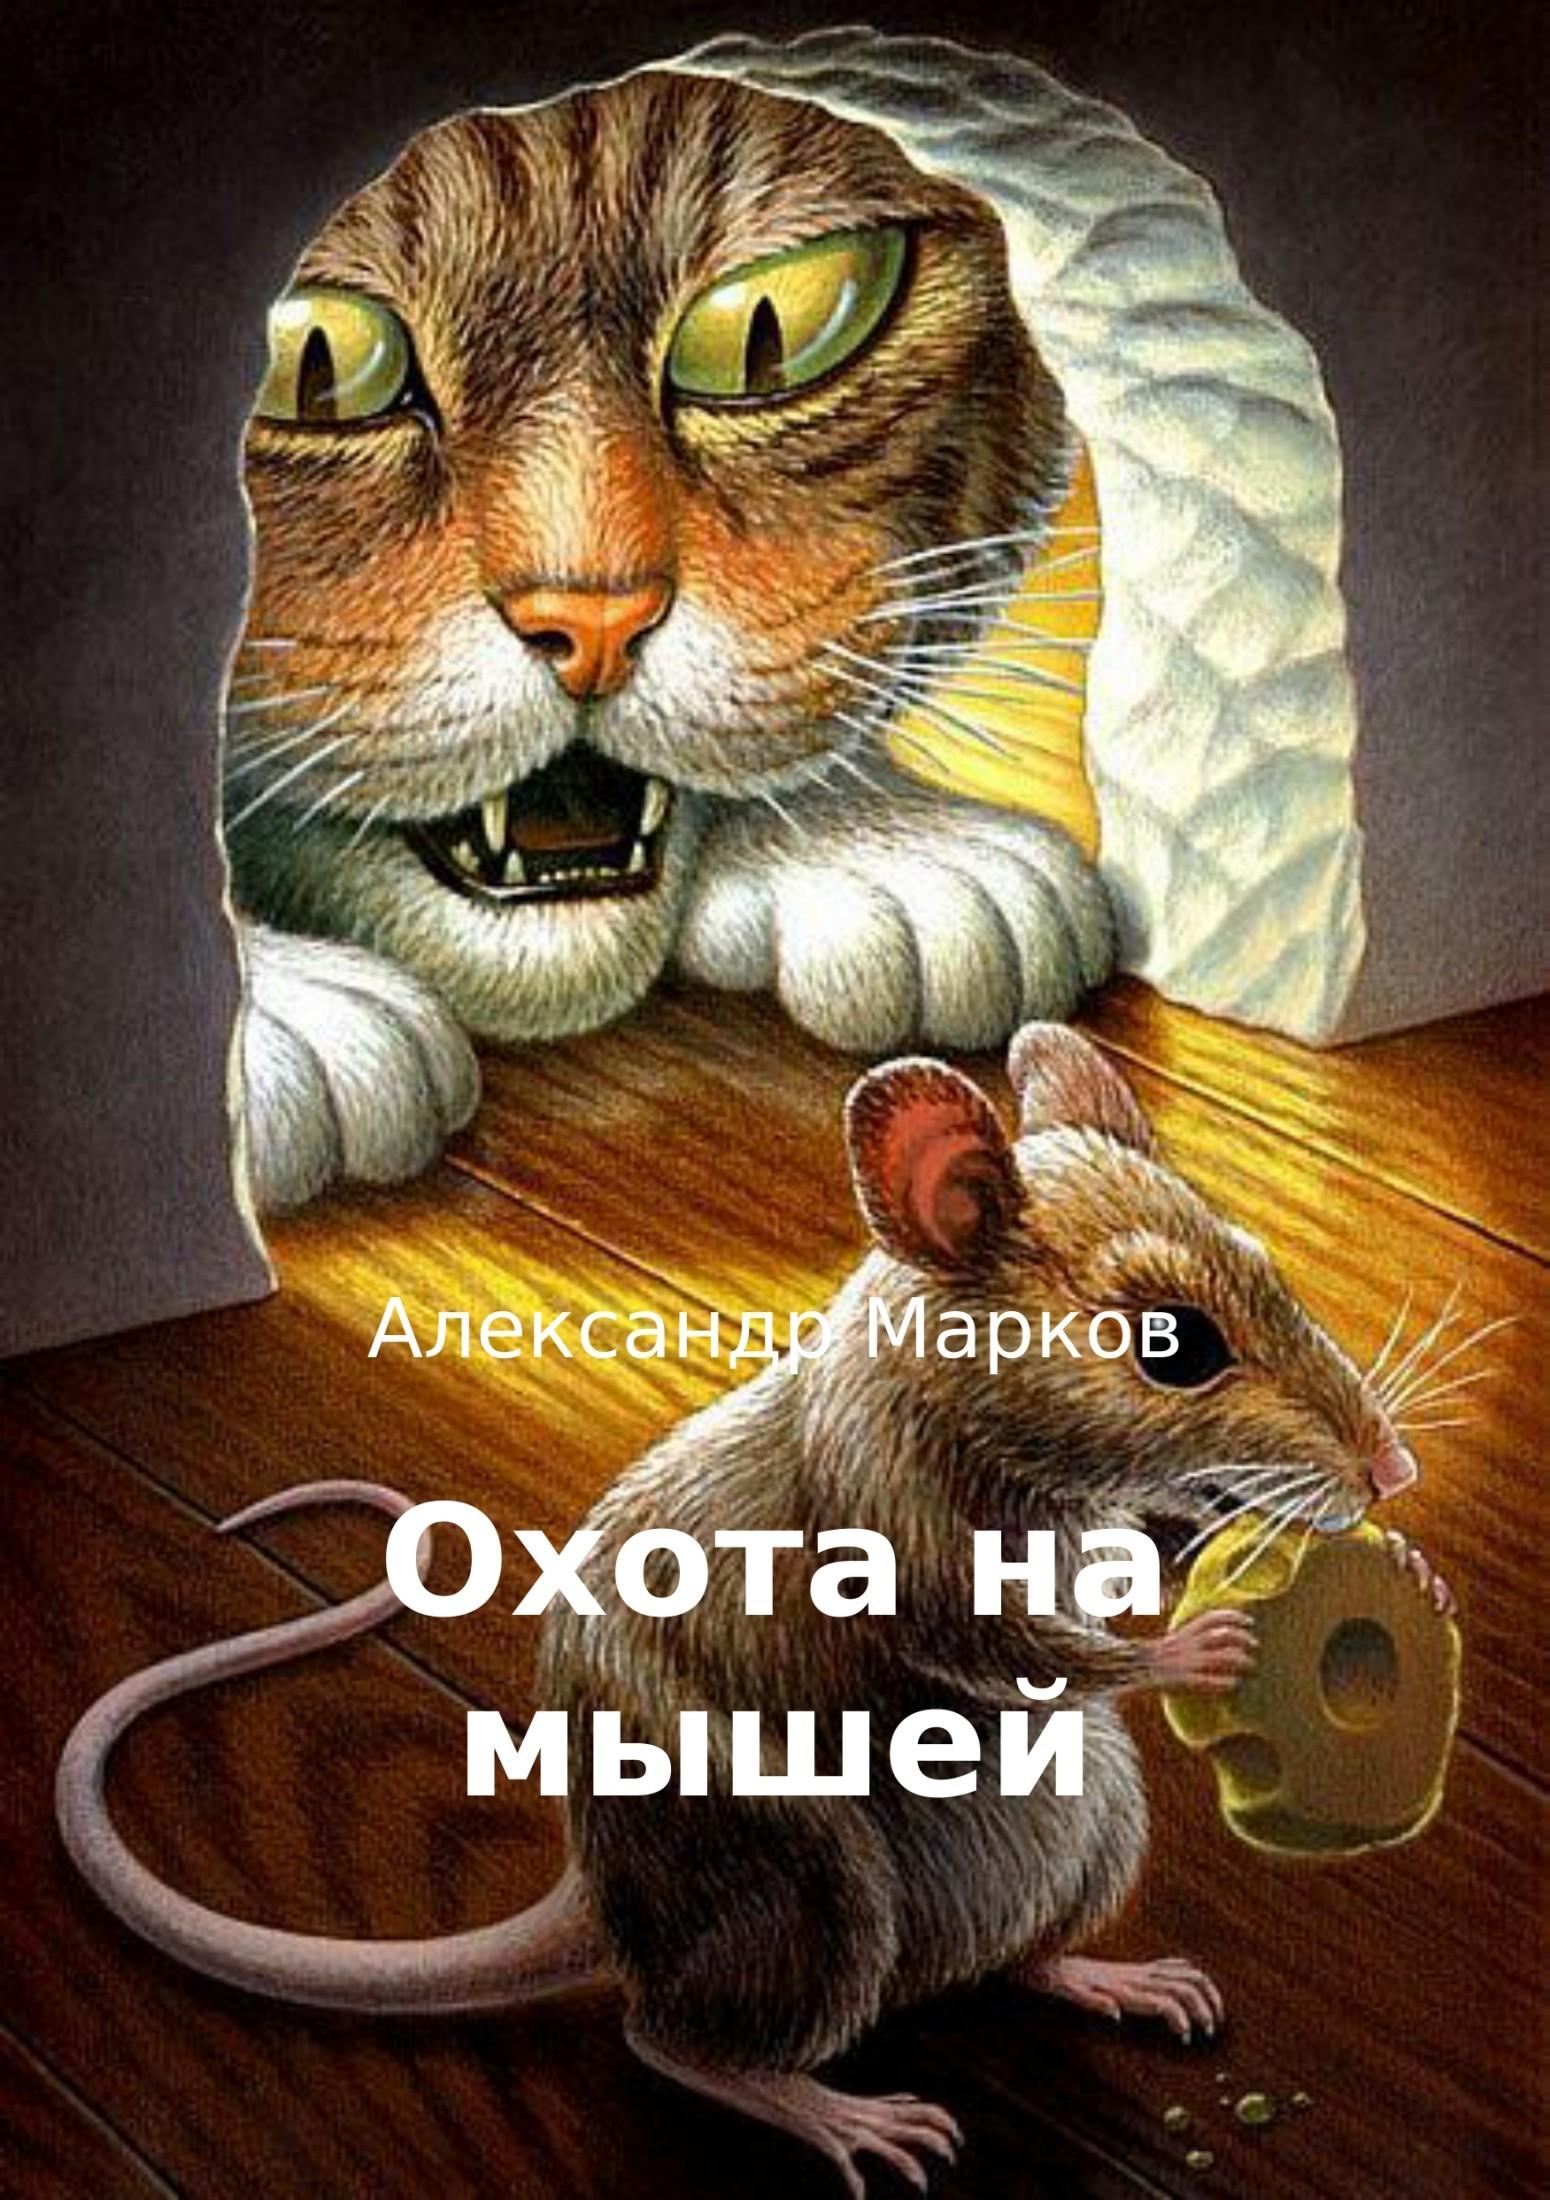 Александр Павлович Марков. Охота на мышей